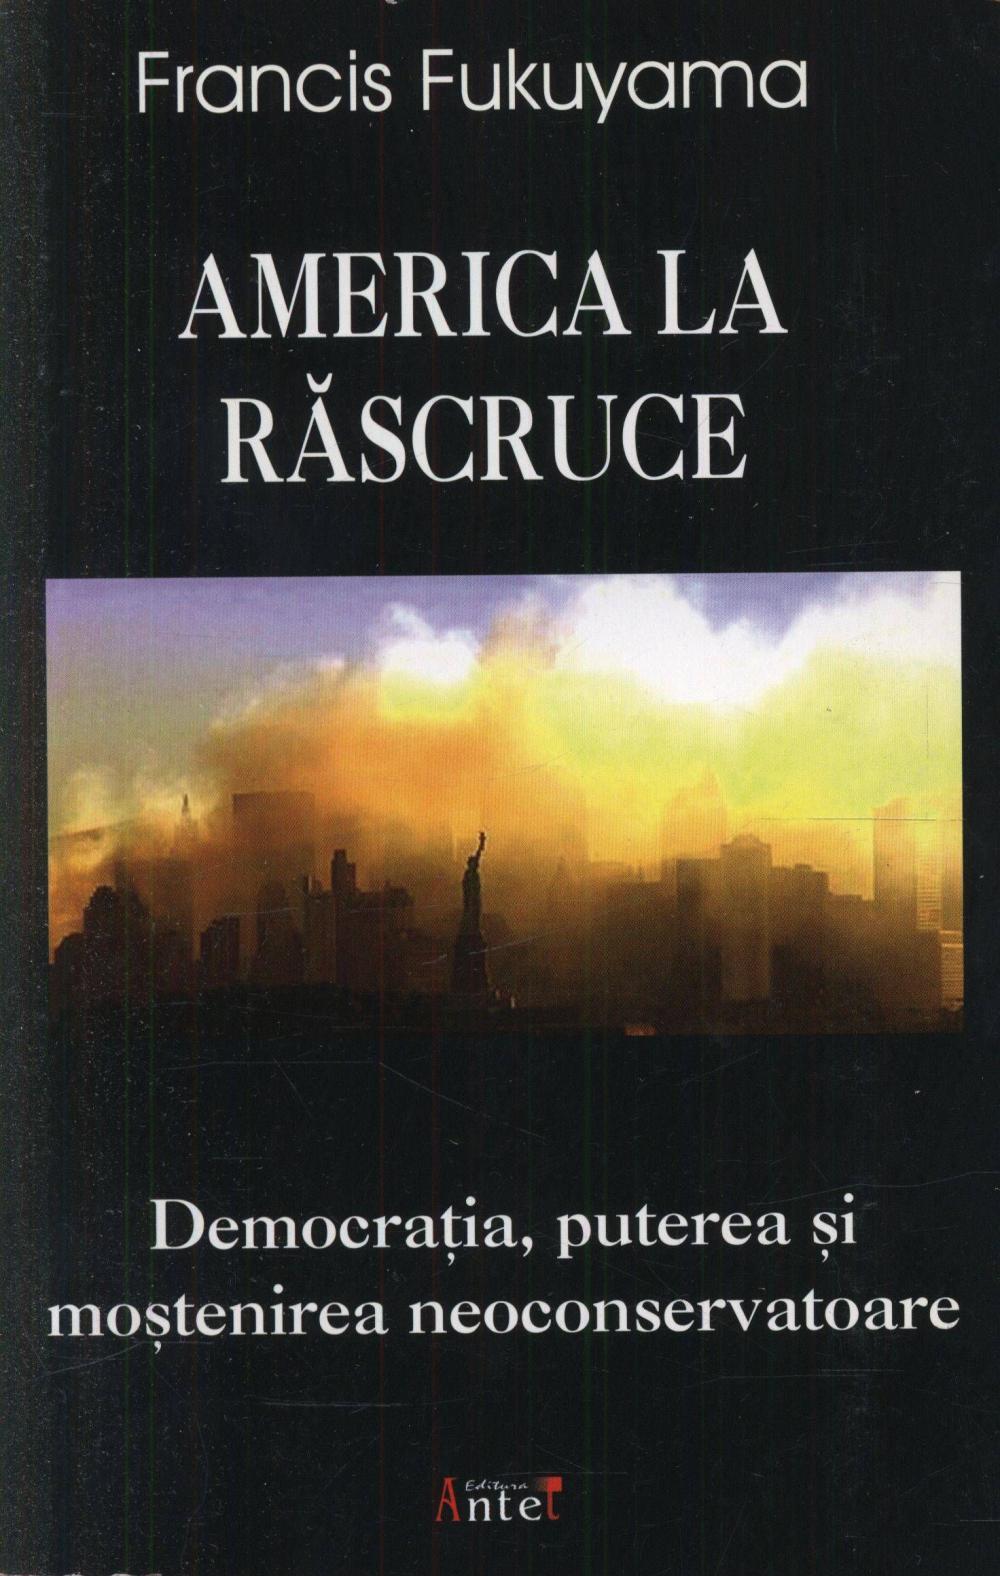 AMERICA LA RASCRUCE